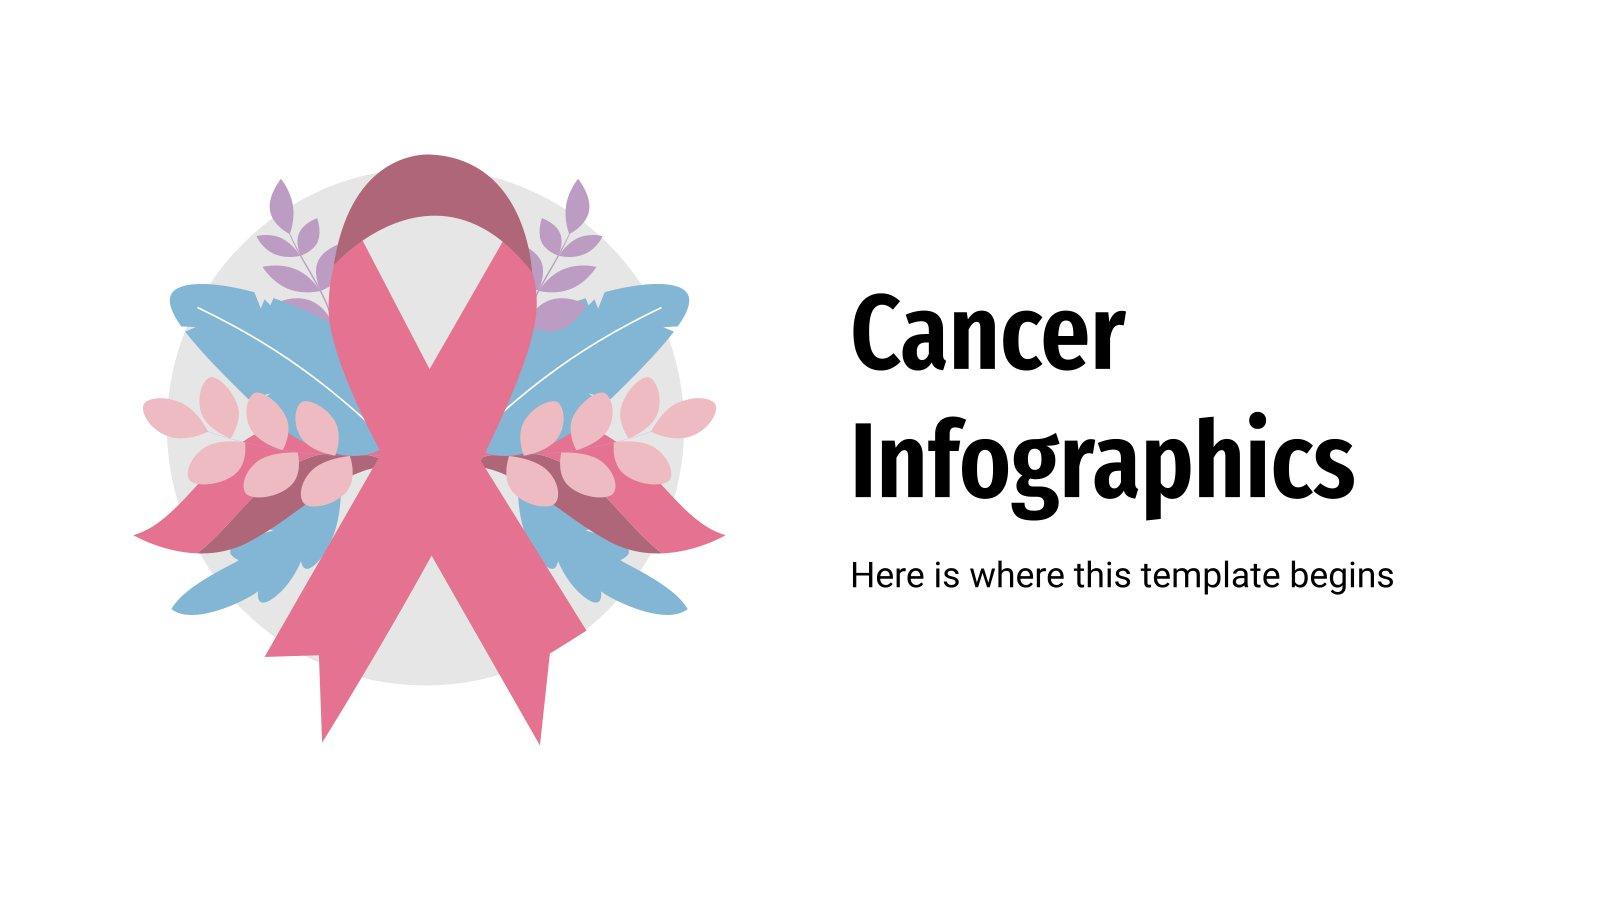 Cancer Infographics presentation template